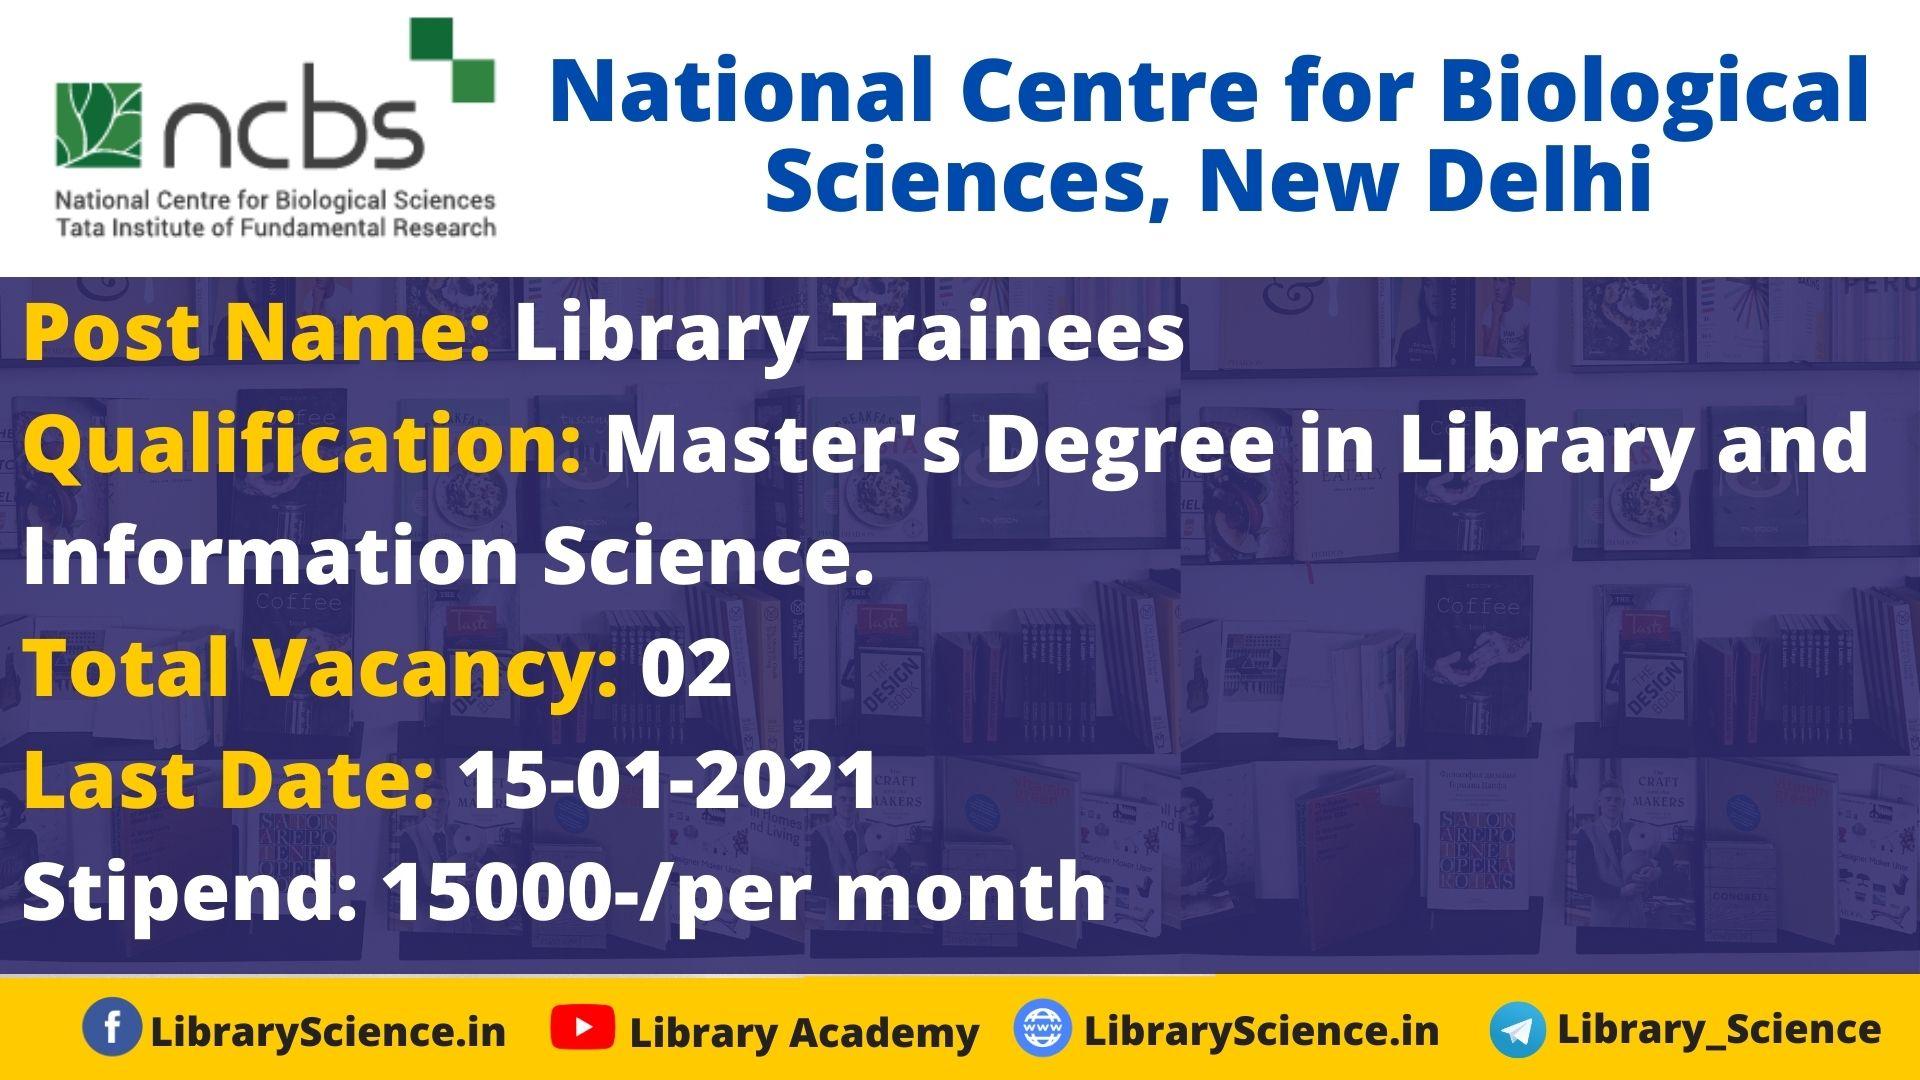 Library Trainees Vacancy 2021 at NCBS, New Delhi